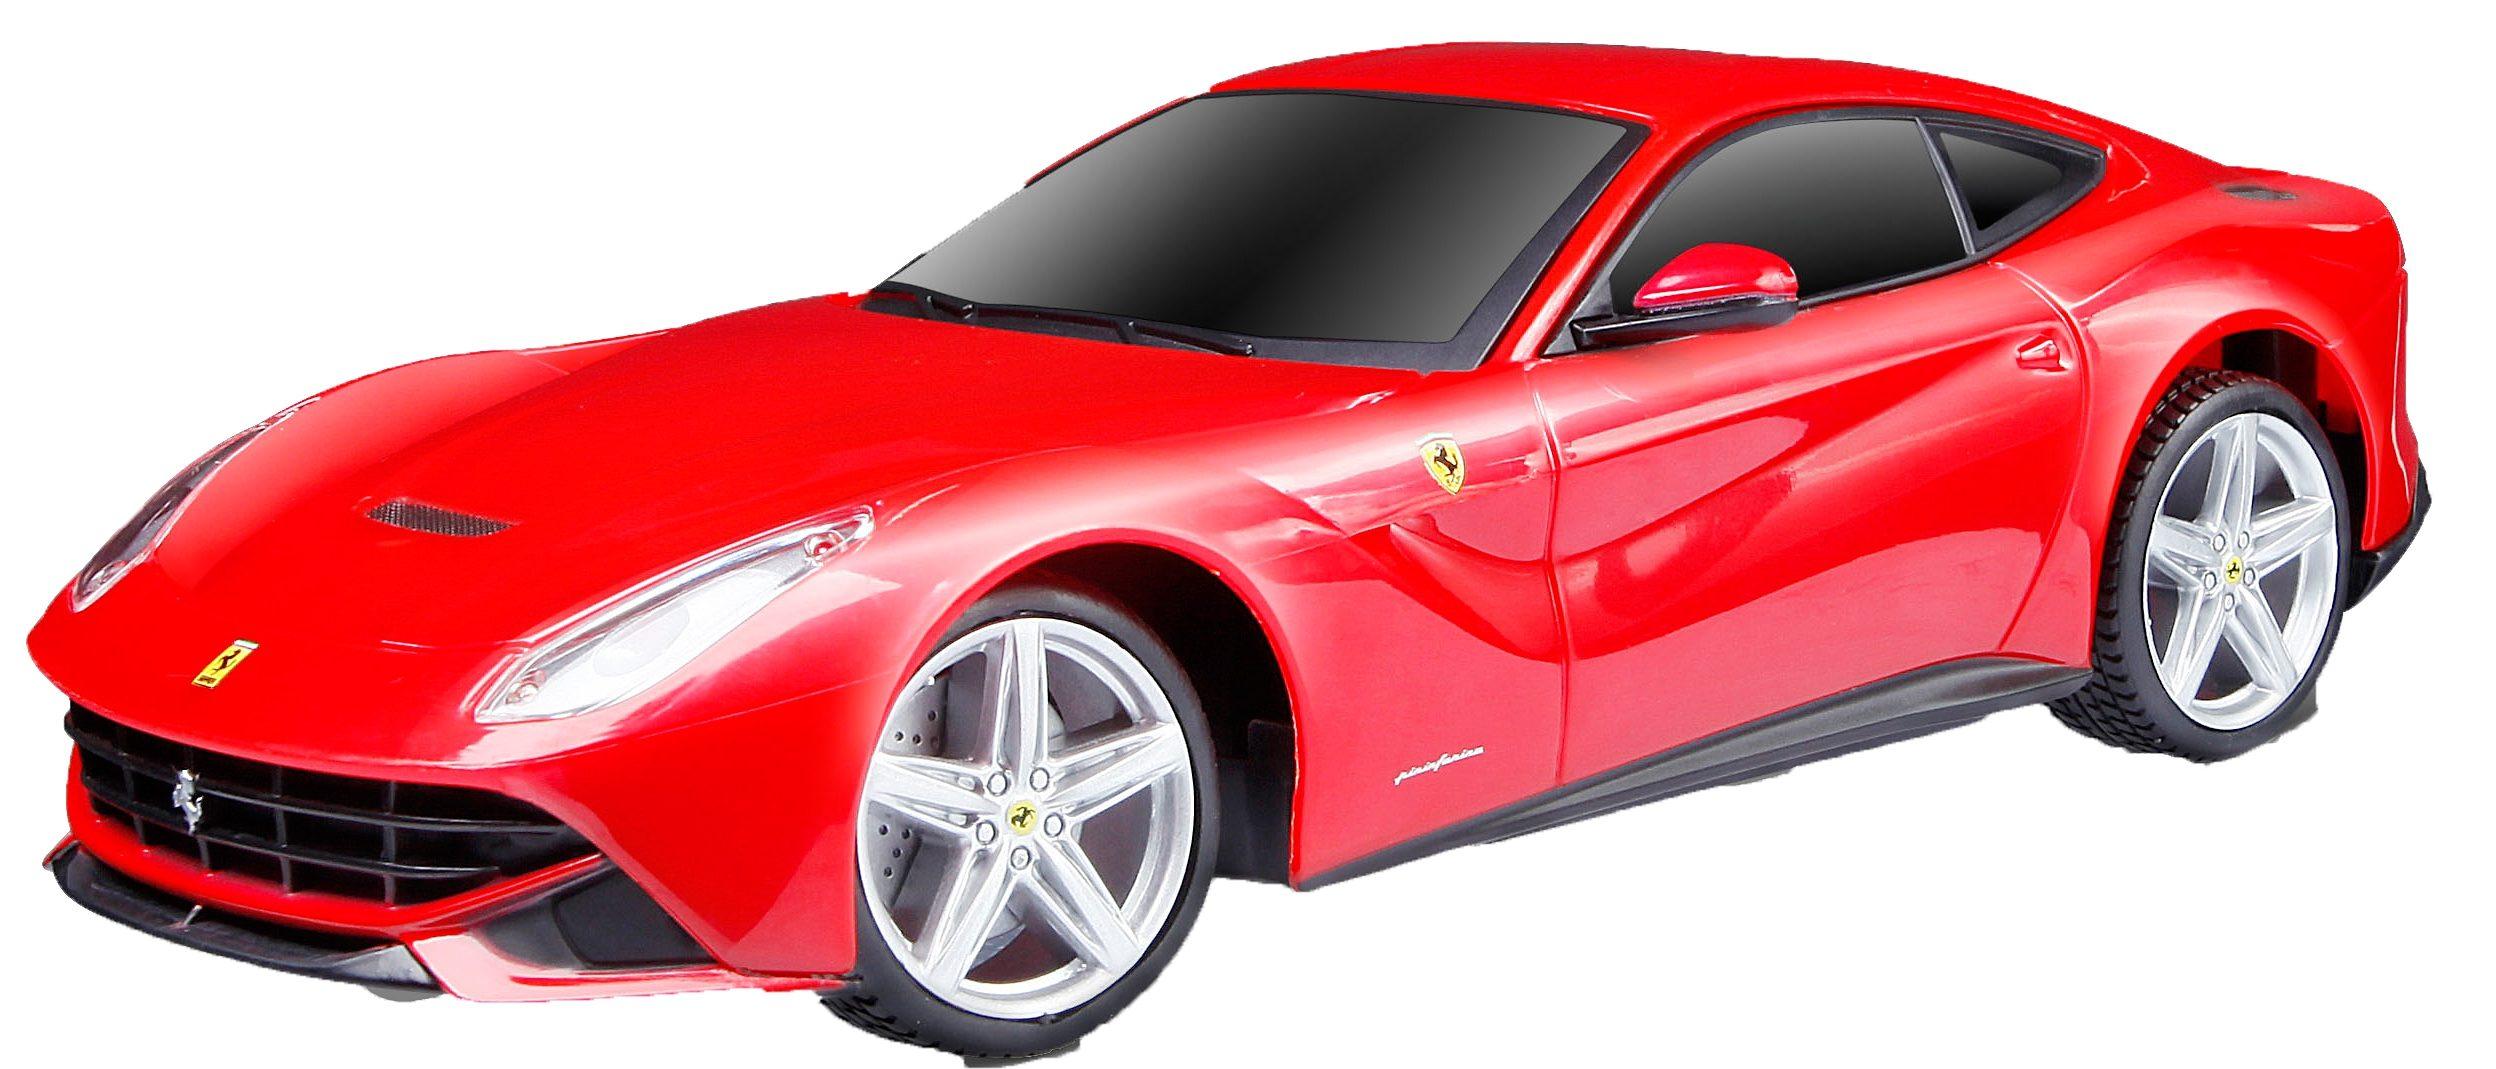 Maisto Tech® RC-Fahrzeug, »Ferrari F12 Berlinetta im originalgetreuen Detail«